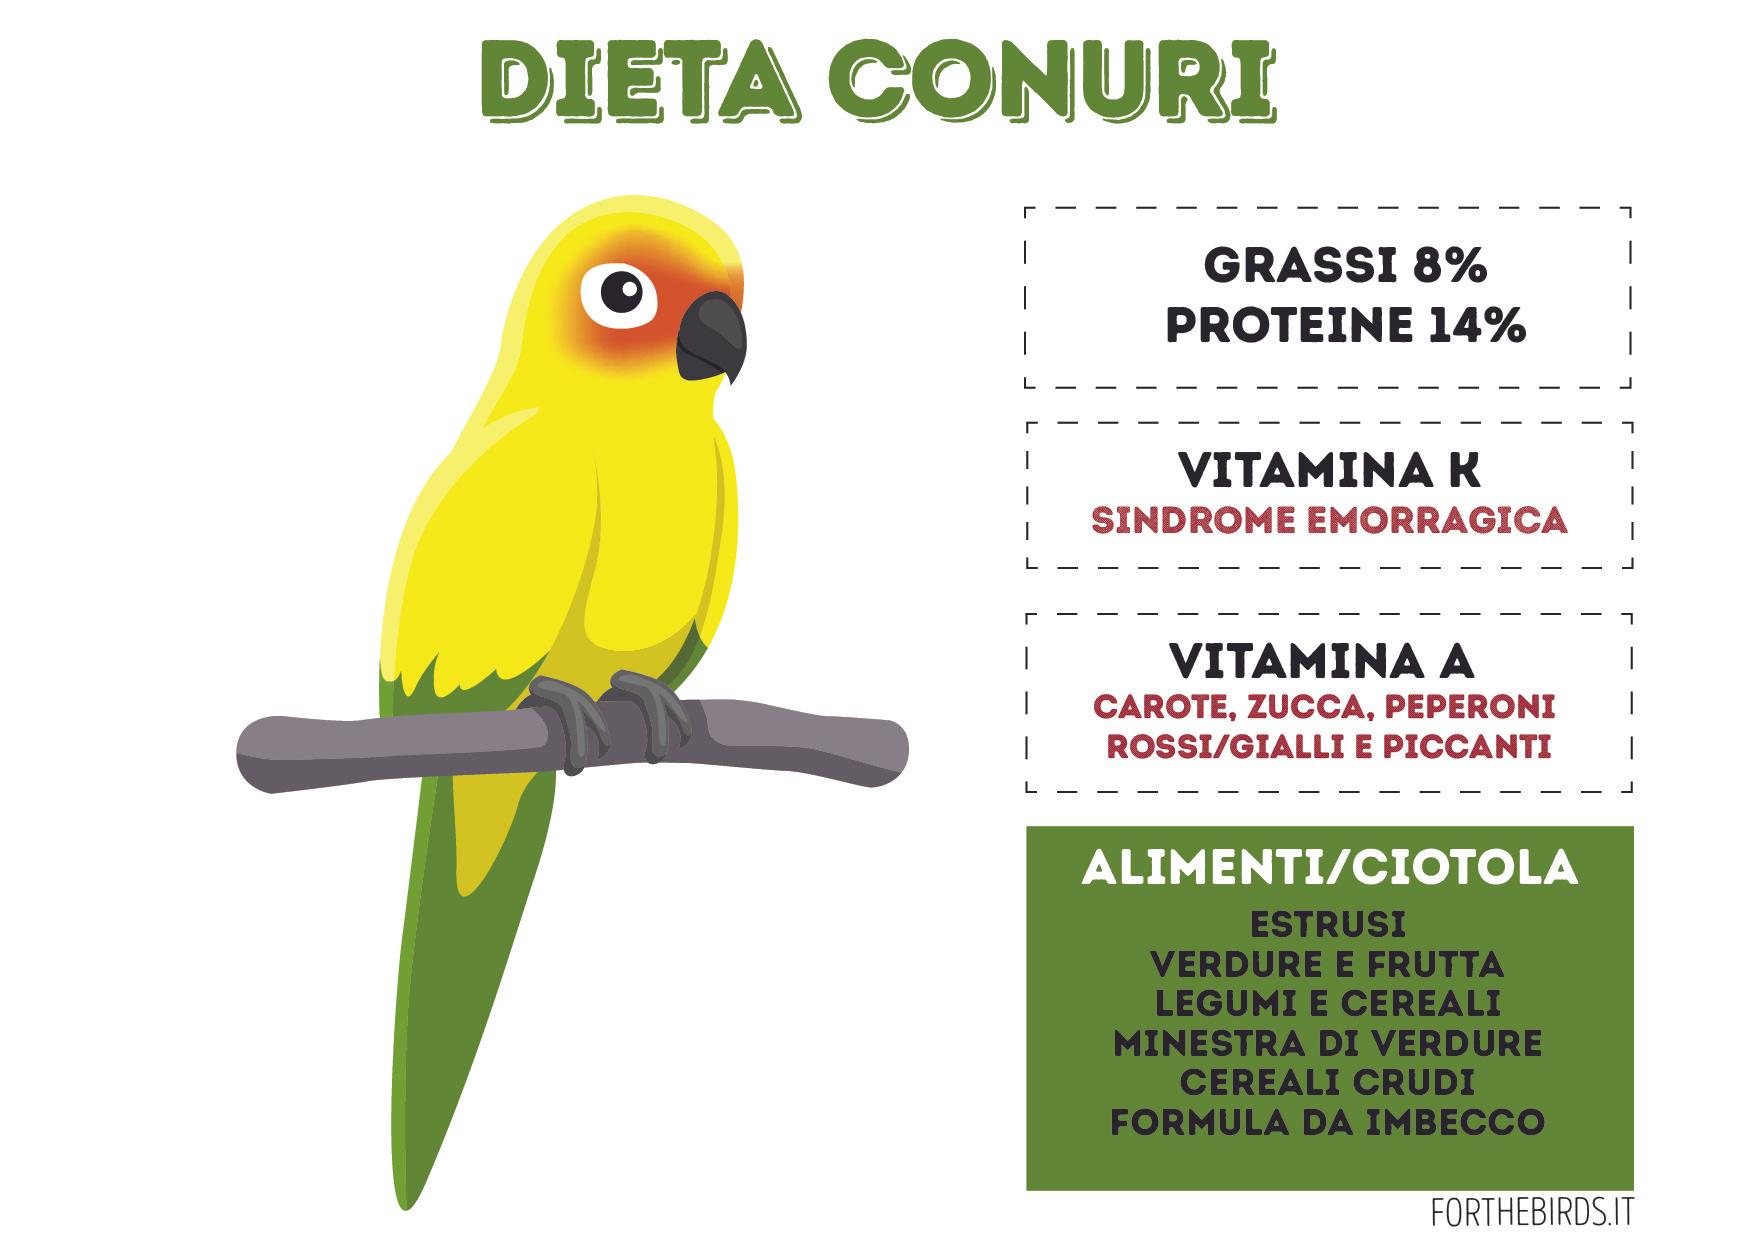 Dieta Conuri